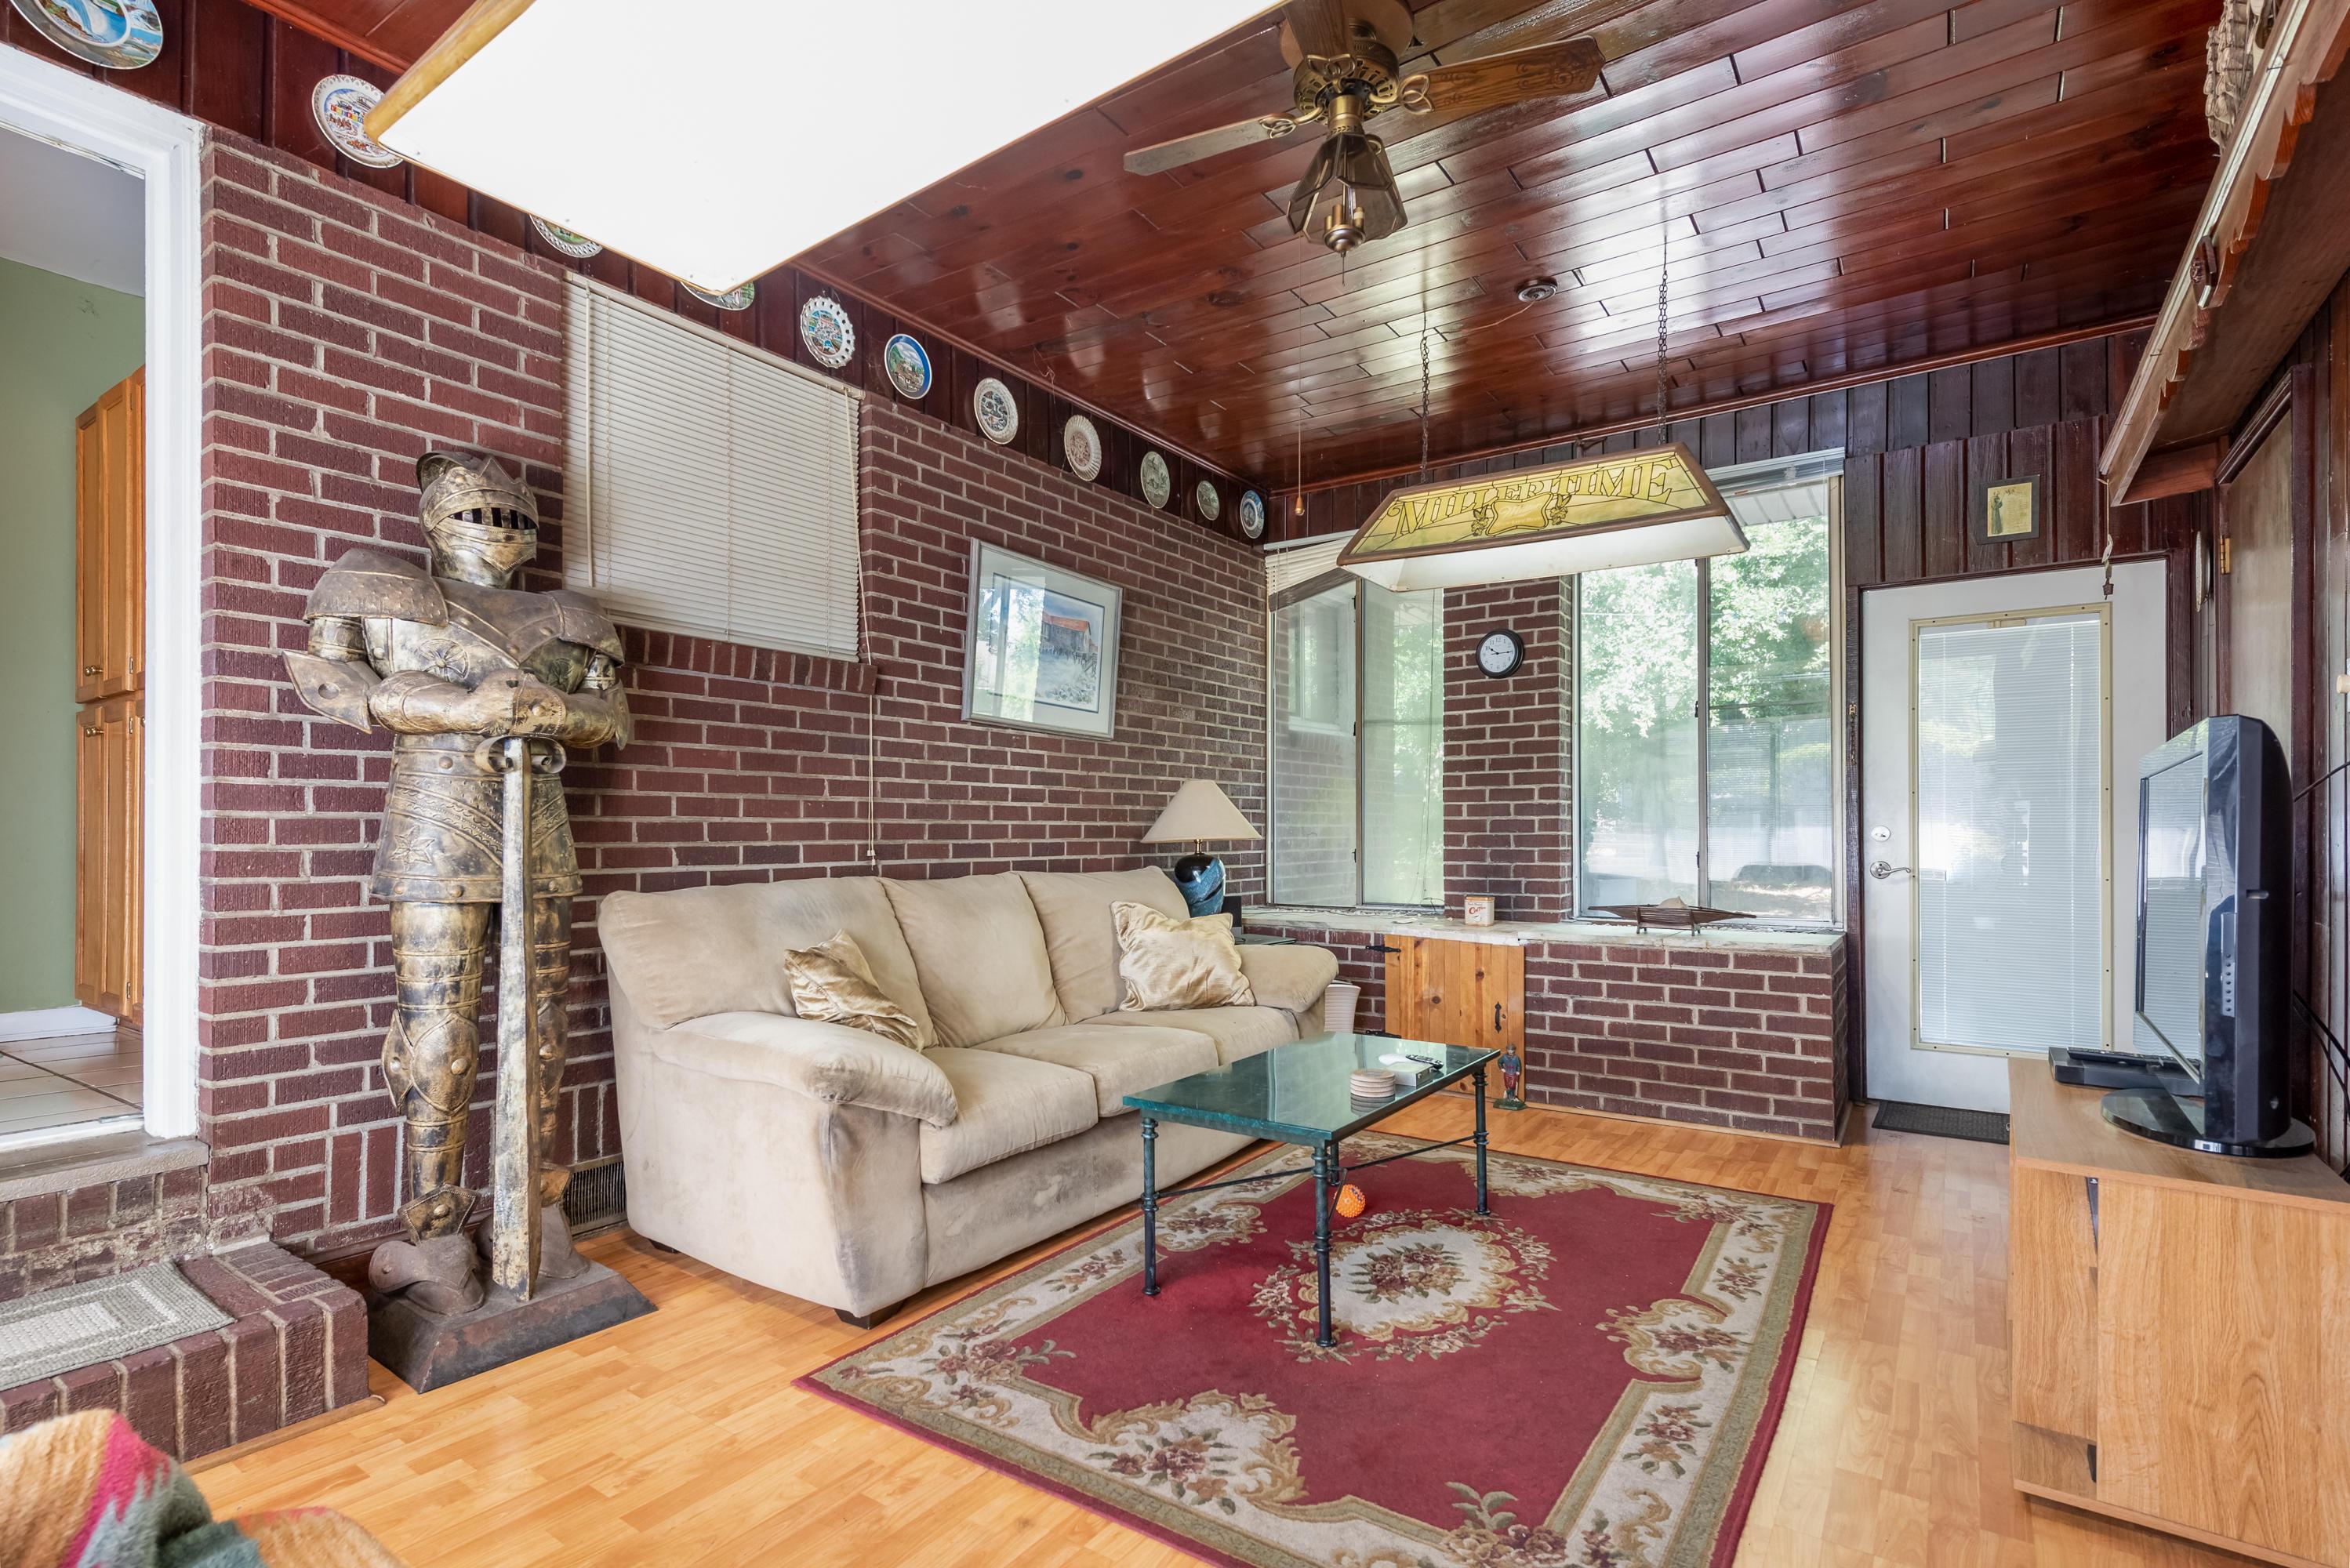 Old Mt Pleasant Homes For Sale - 916 Kincade, Mount Pleasant, SC - 17